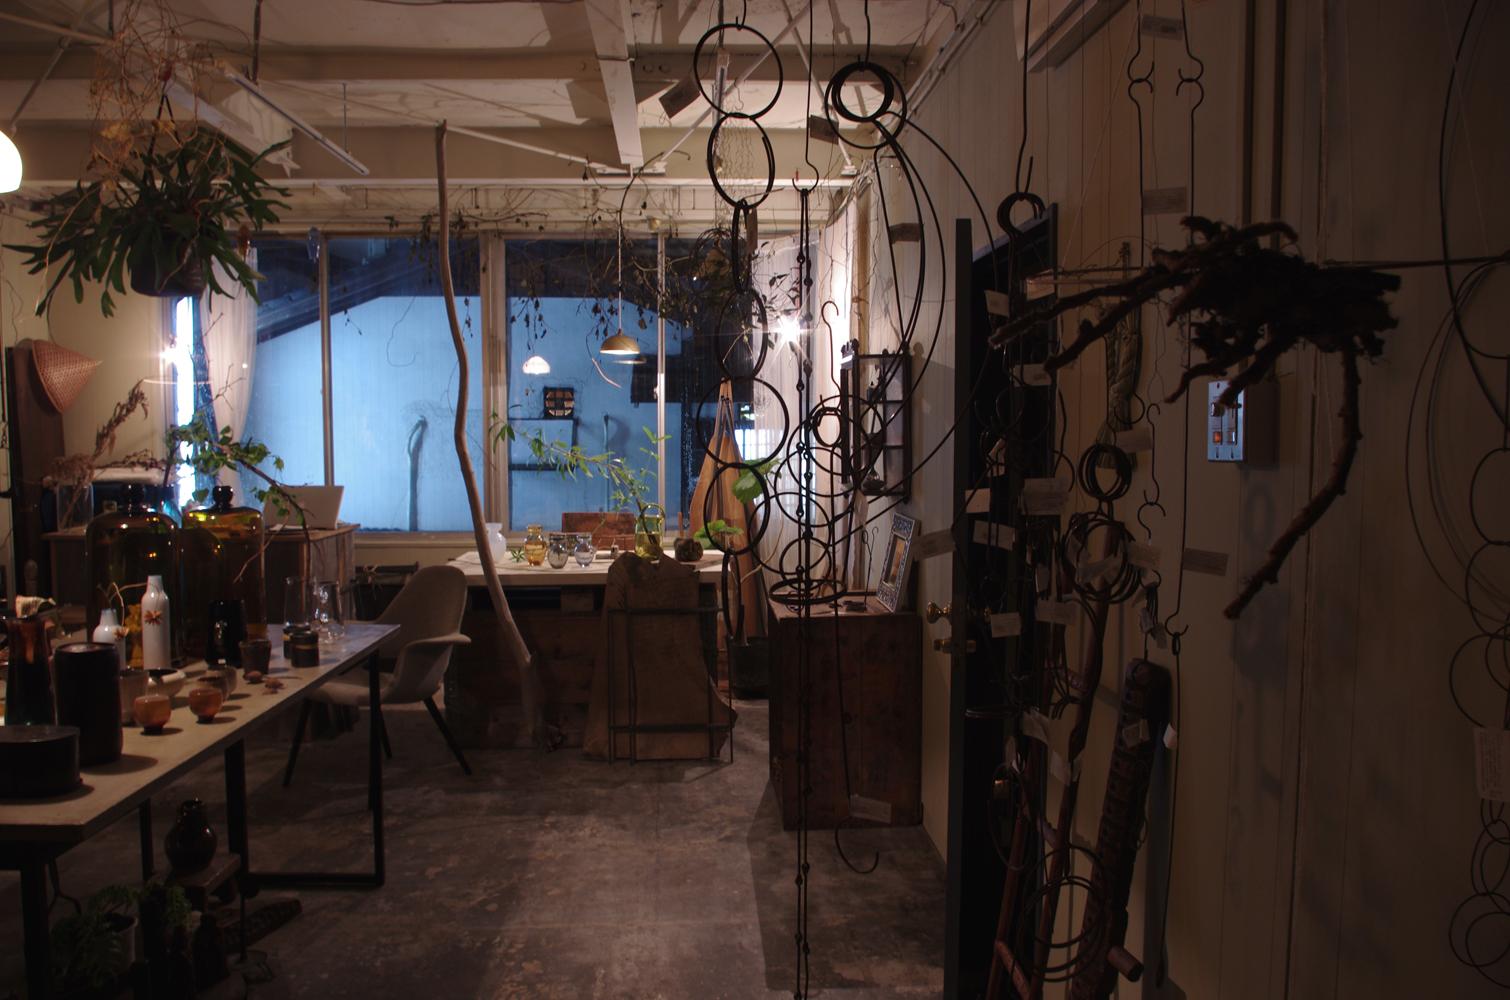 tipura-studio-ironworks-exhibition-25